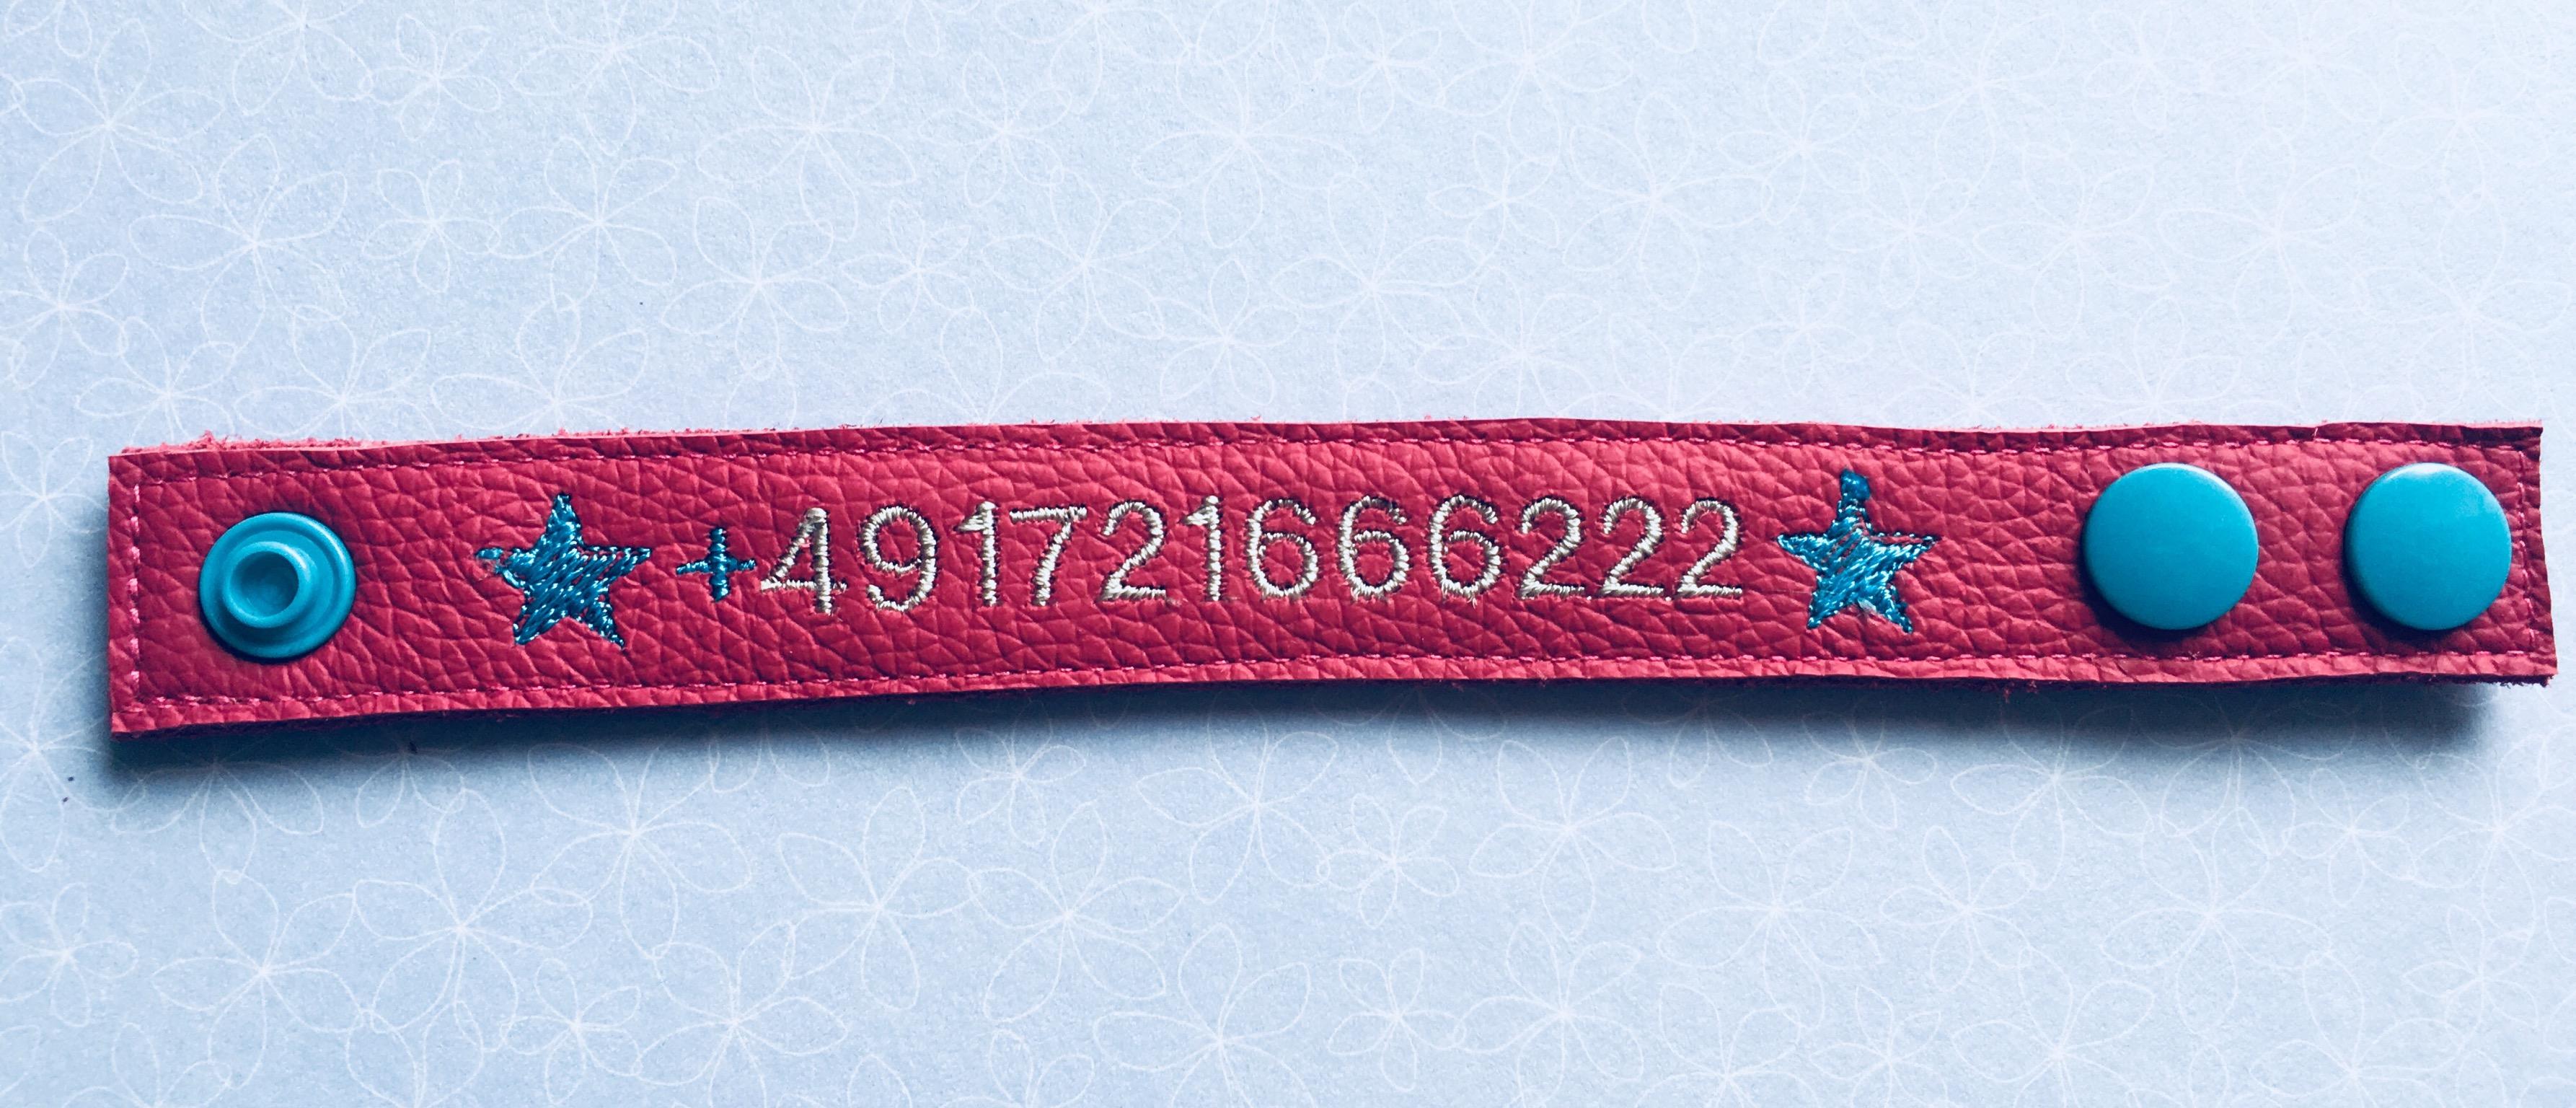 SOS Armband Rückseite mit Telefonummer